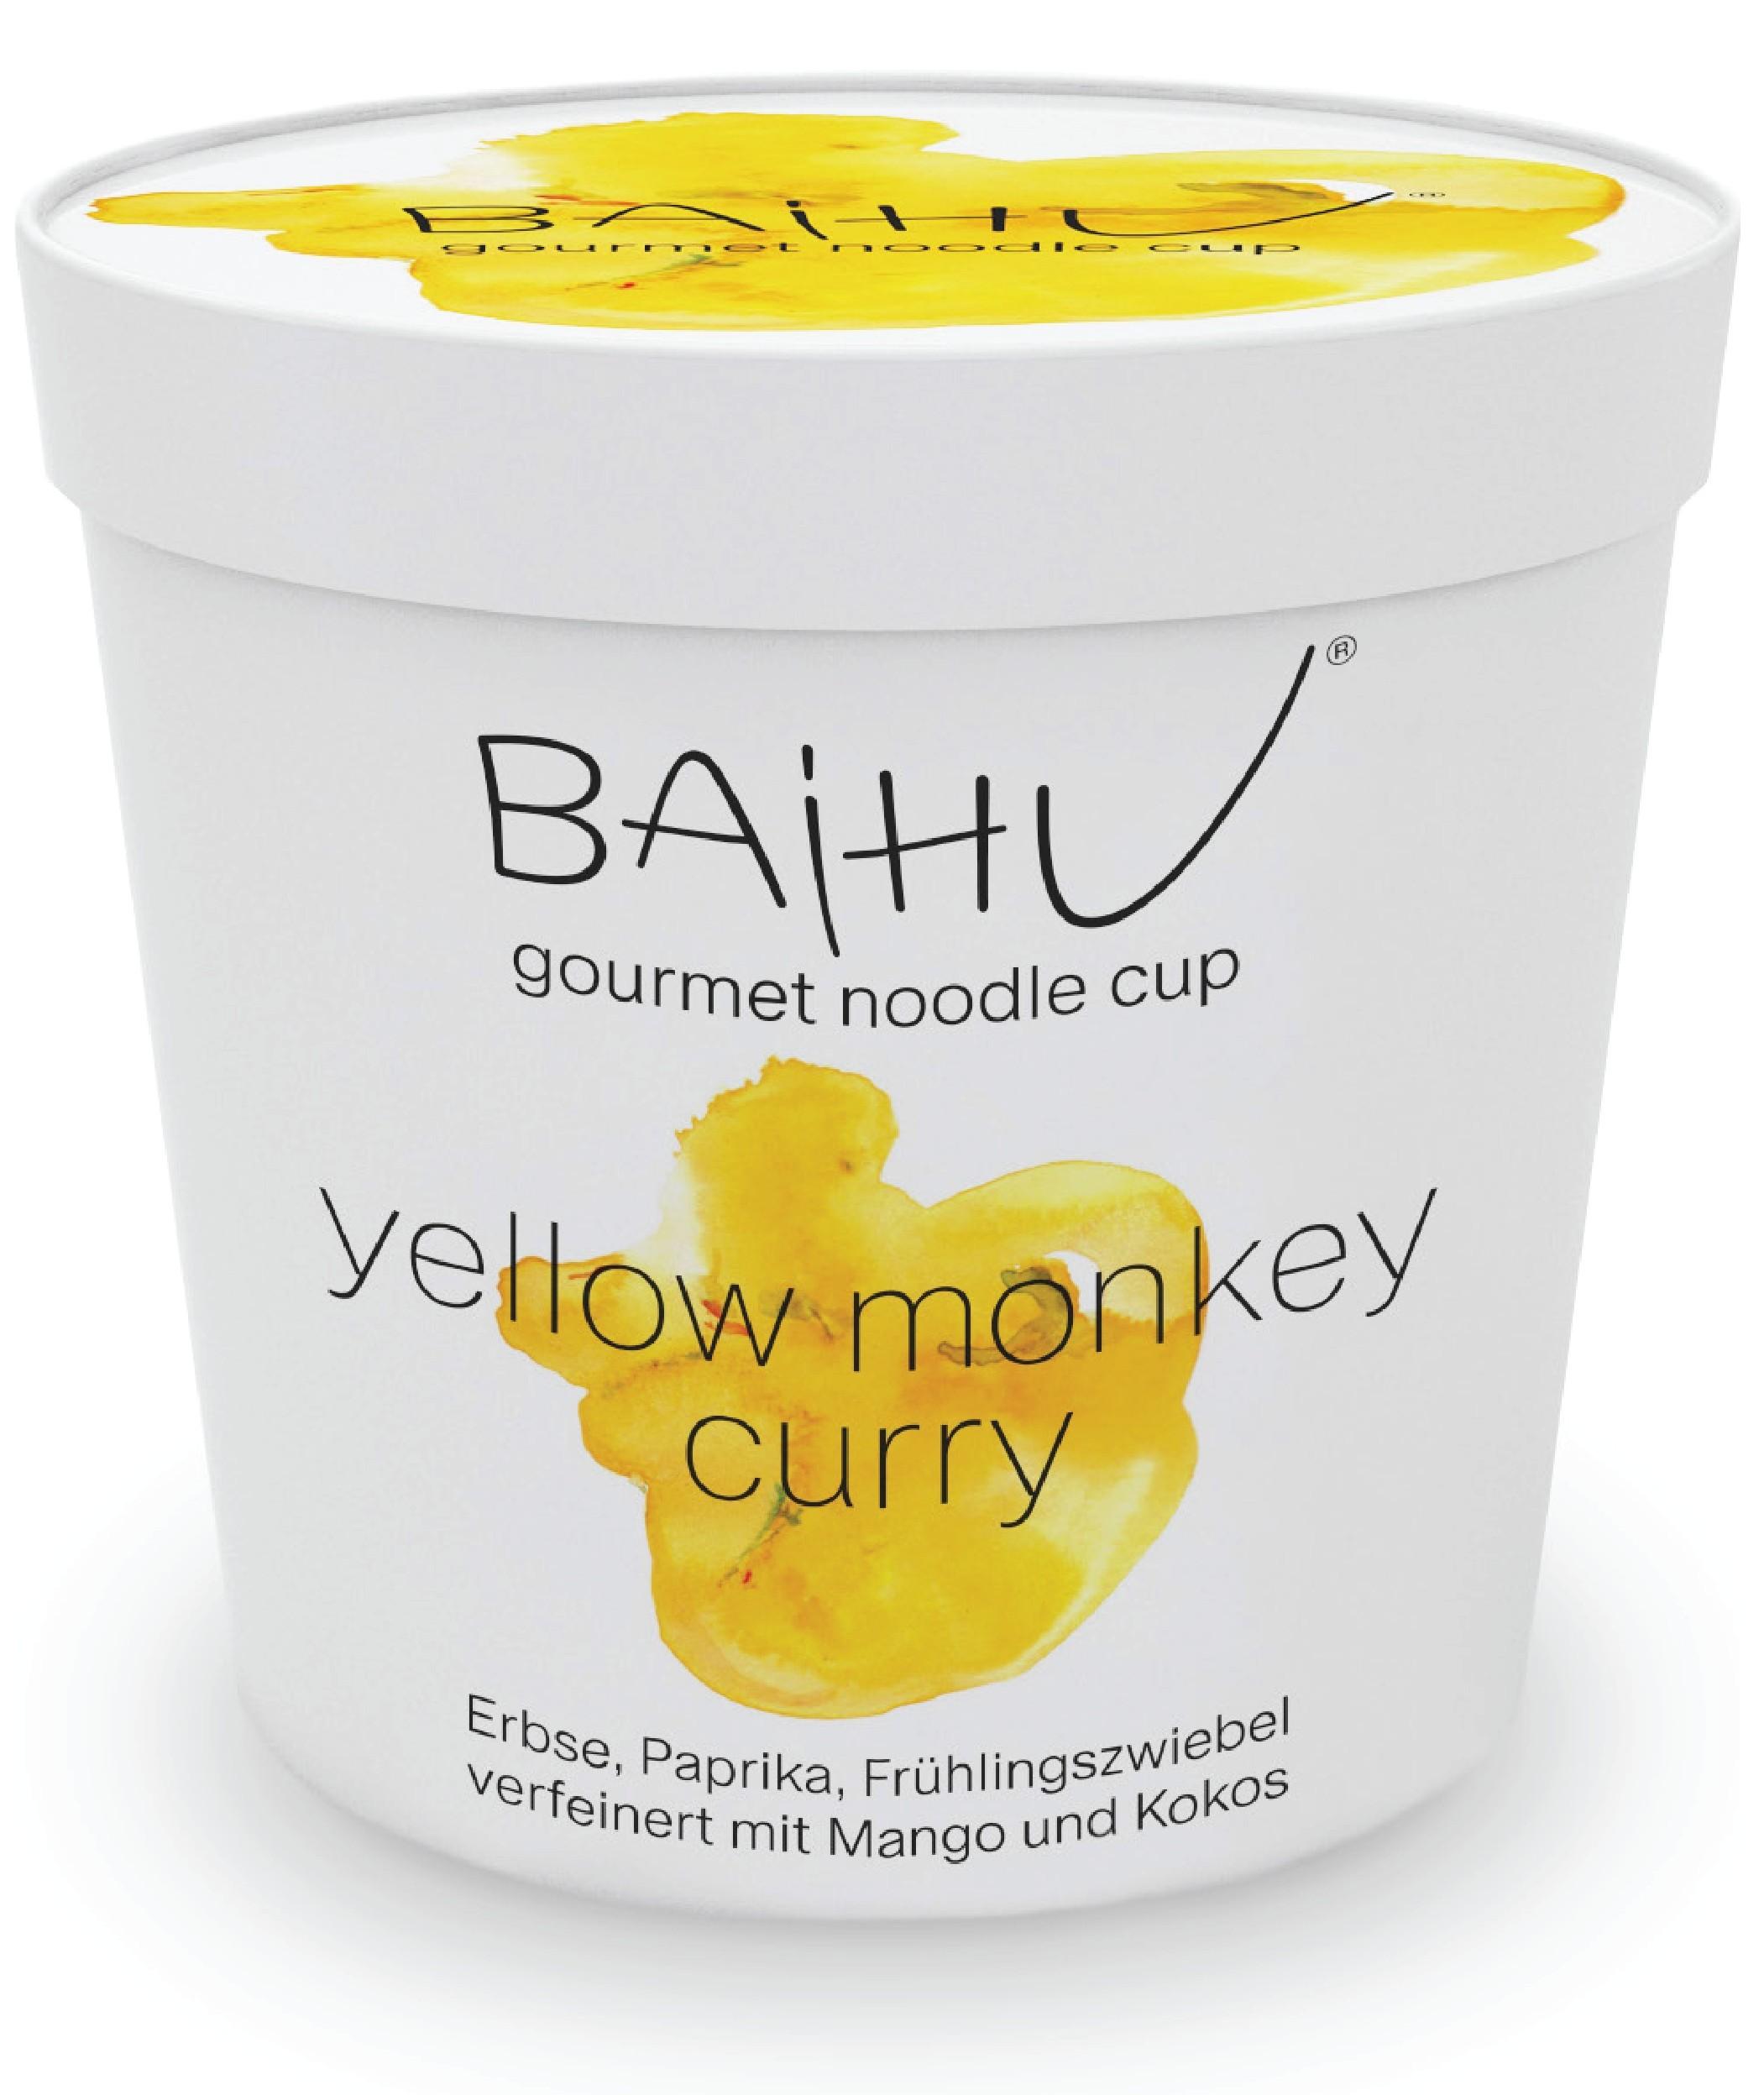 "BAiHU - ausgezeichnetes Produkt PETA ""Vegan Food Award 2020"""